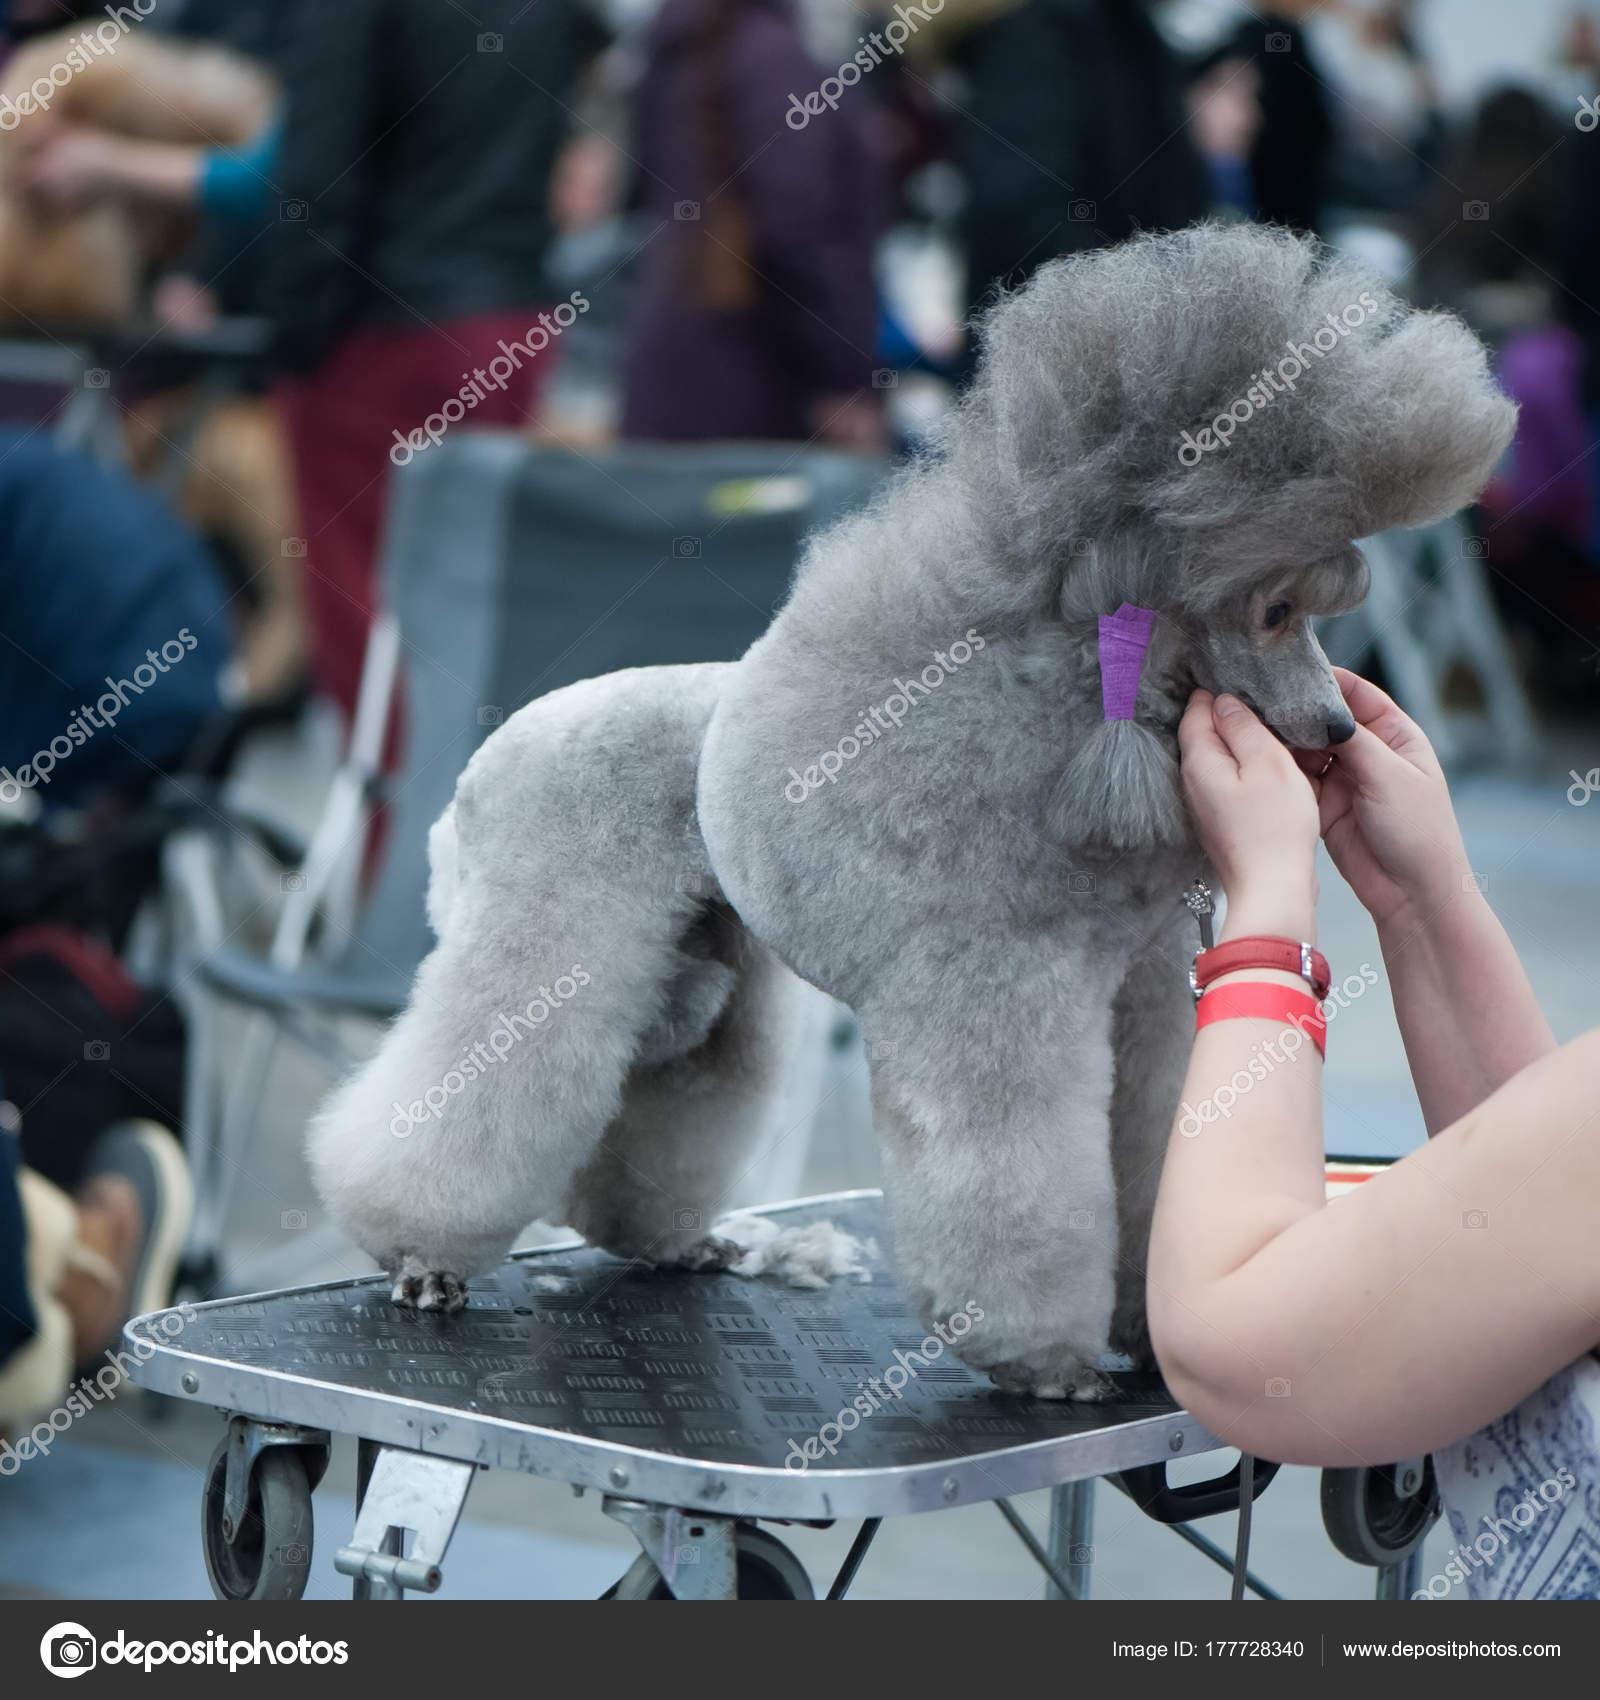 Adorable Poodle Dog Show